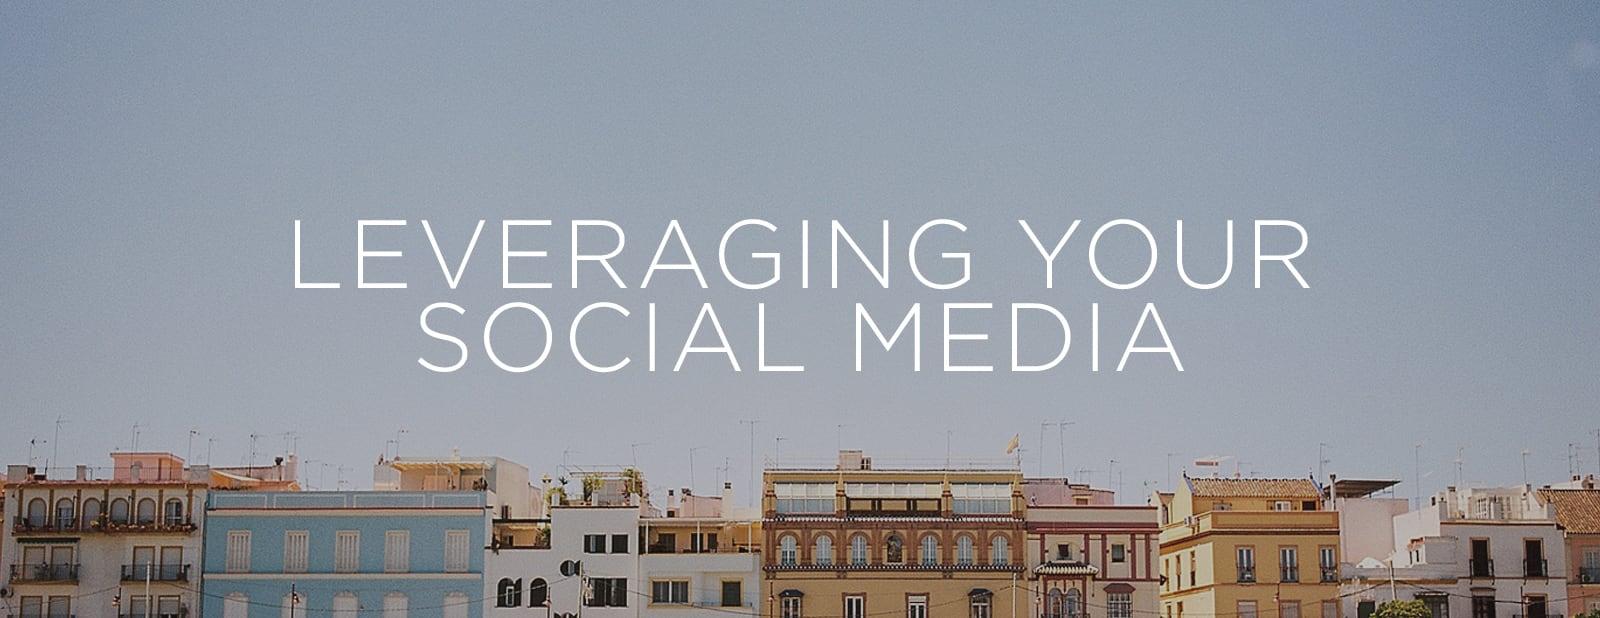 Leveraging Your Social Media | via the Rising Tide Society